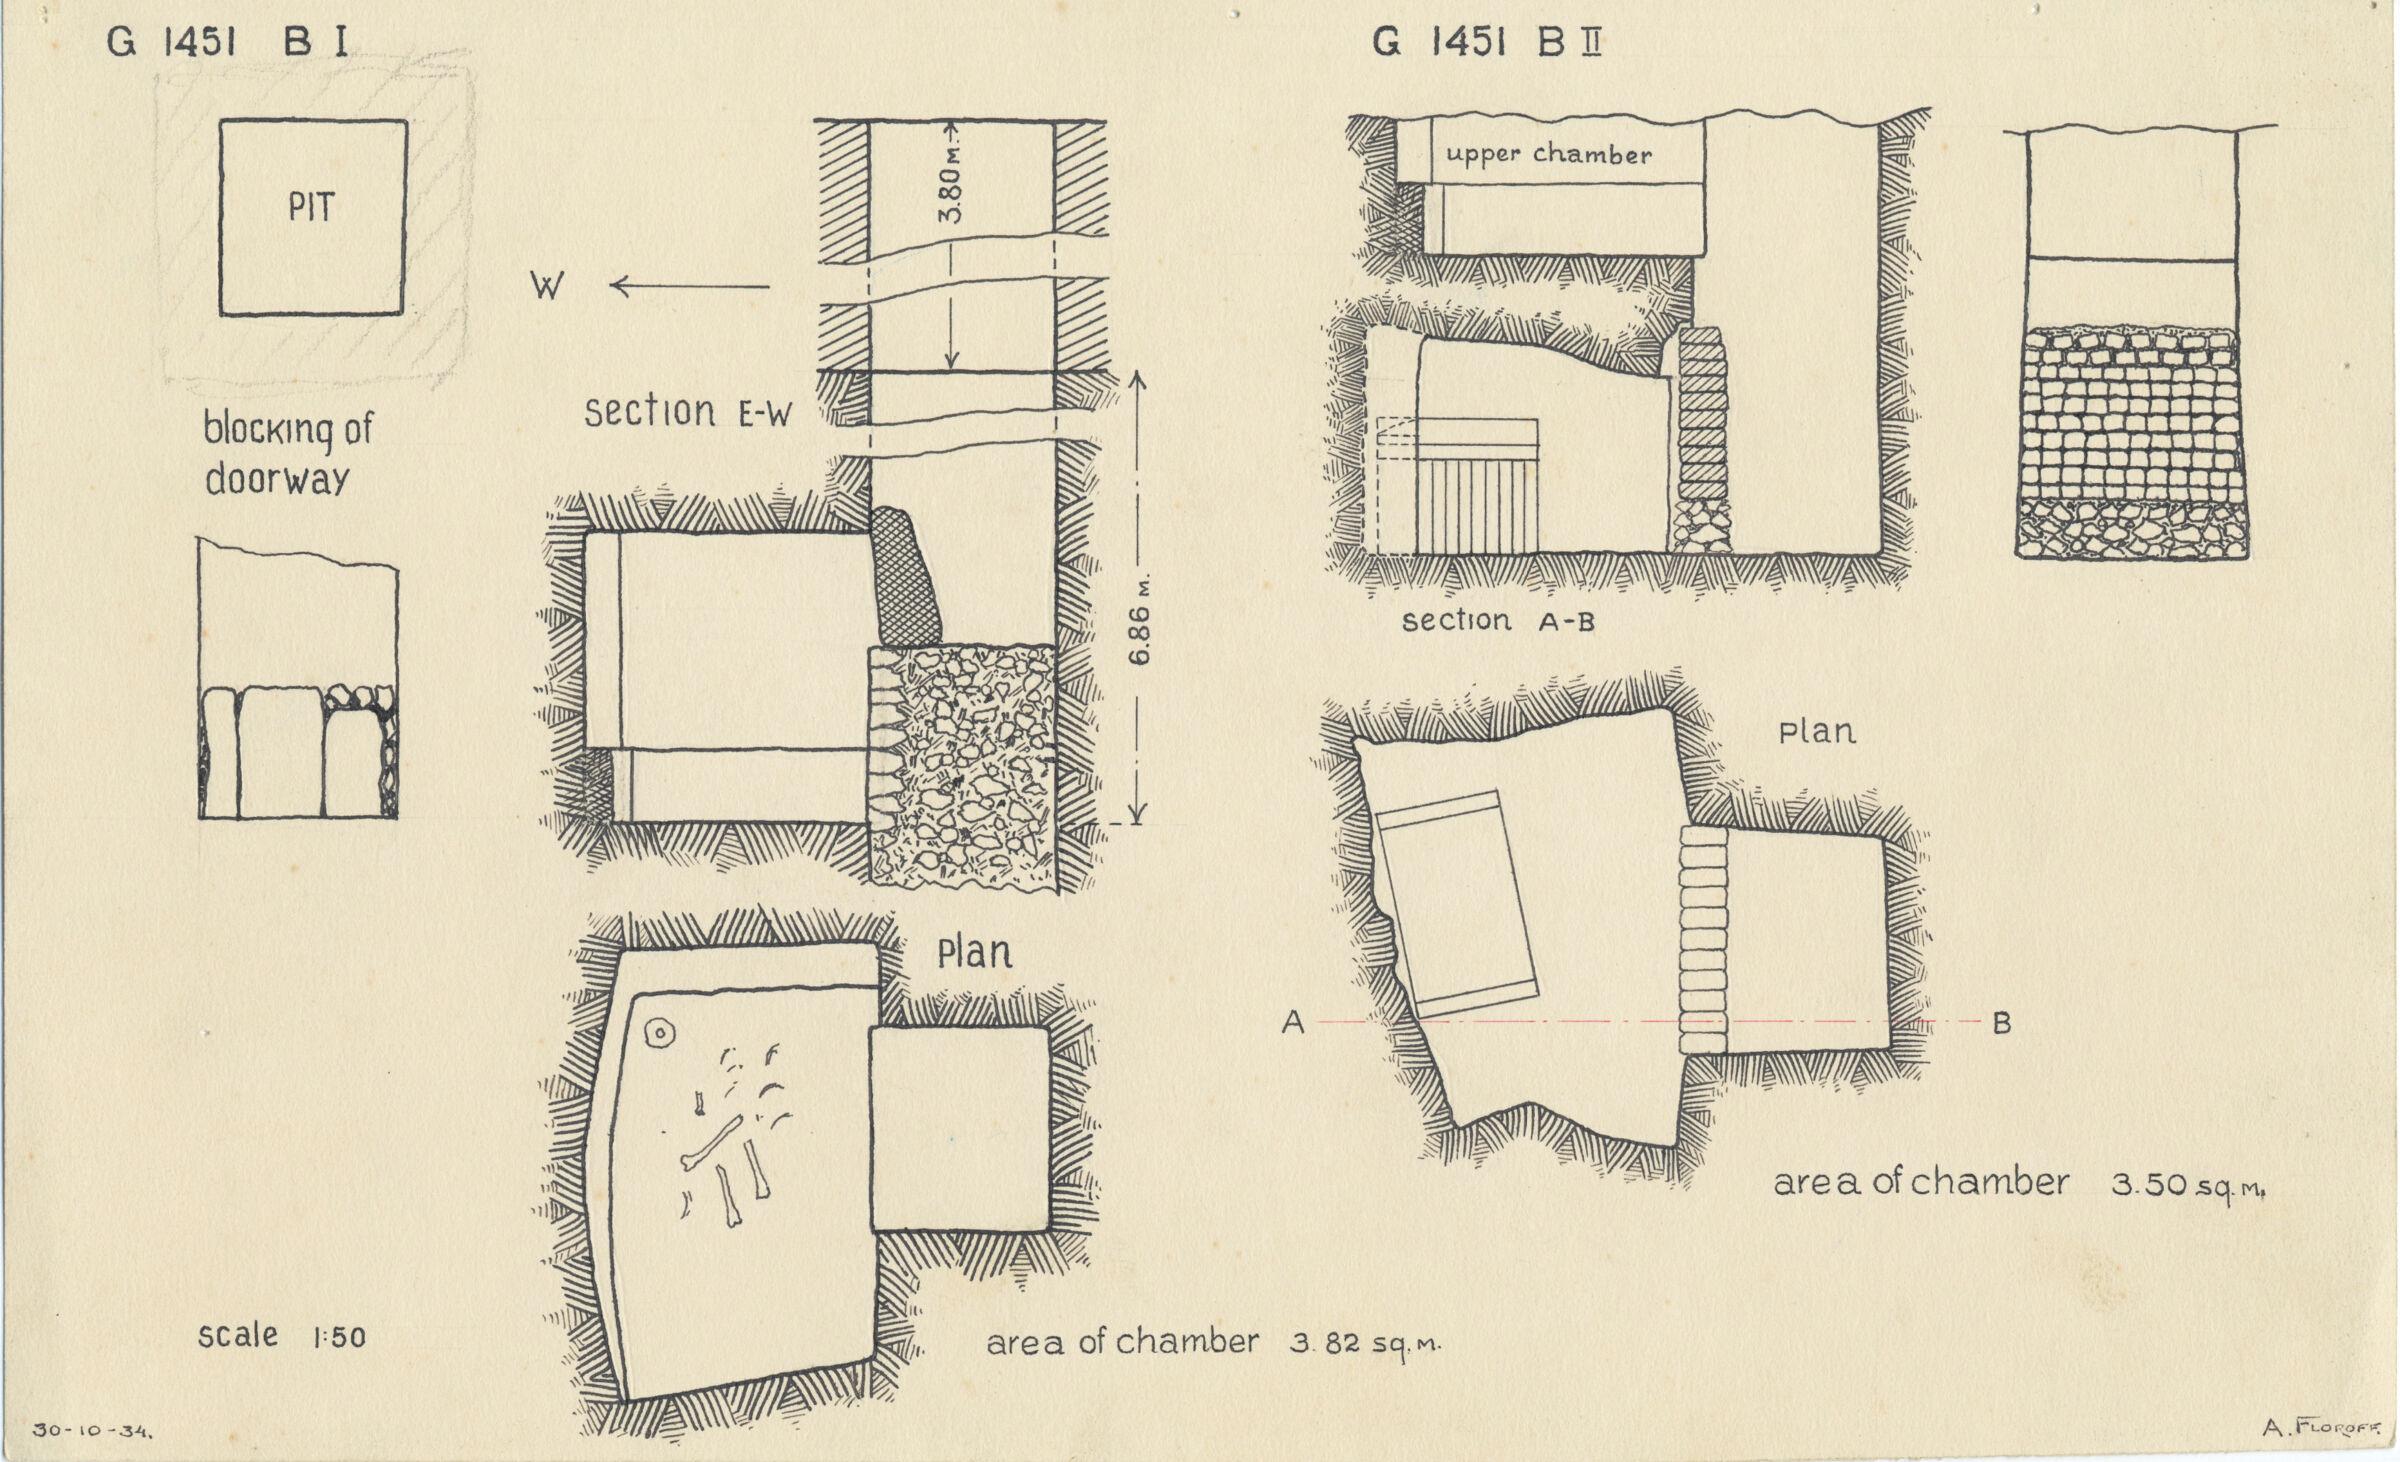 Maps and plans: G 1451, Shaft B (I & II)